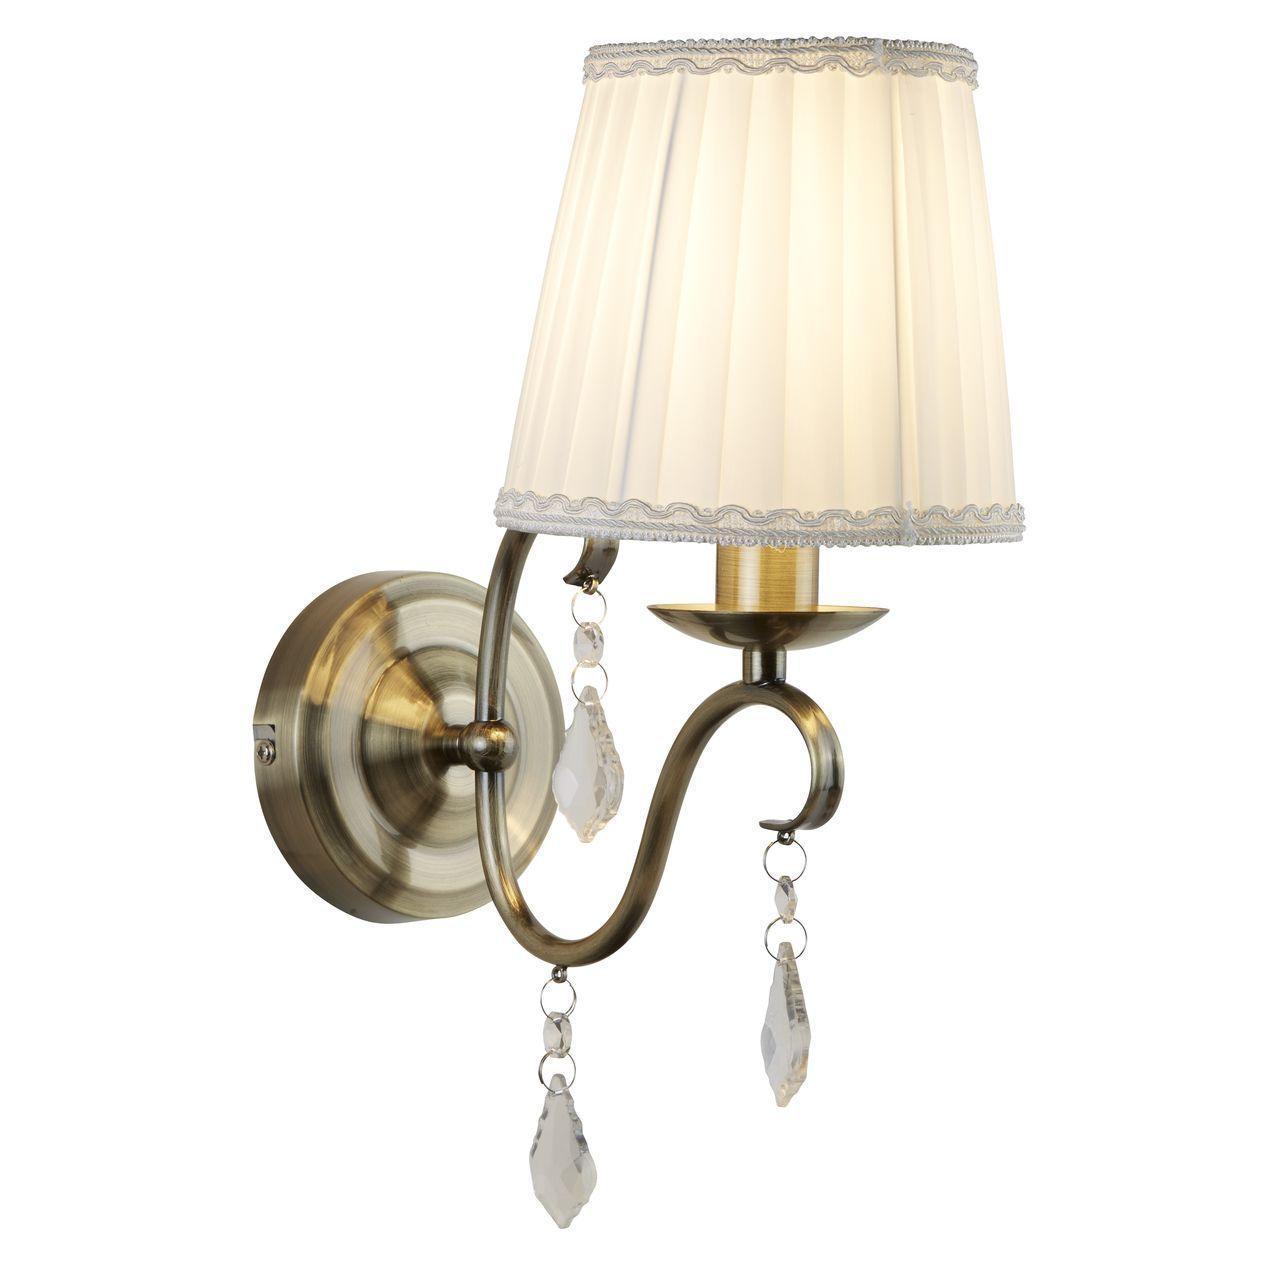 Бра Arte Lamp Innamorata A2313AP-1AB светильник настенный arte lamp a2313ap 1ab